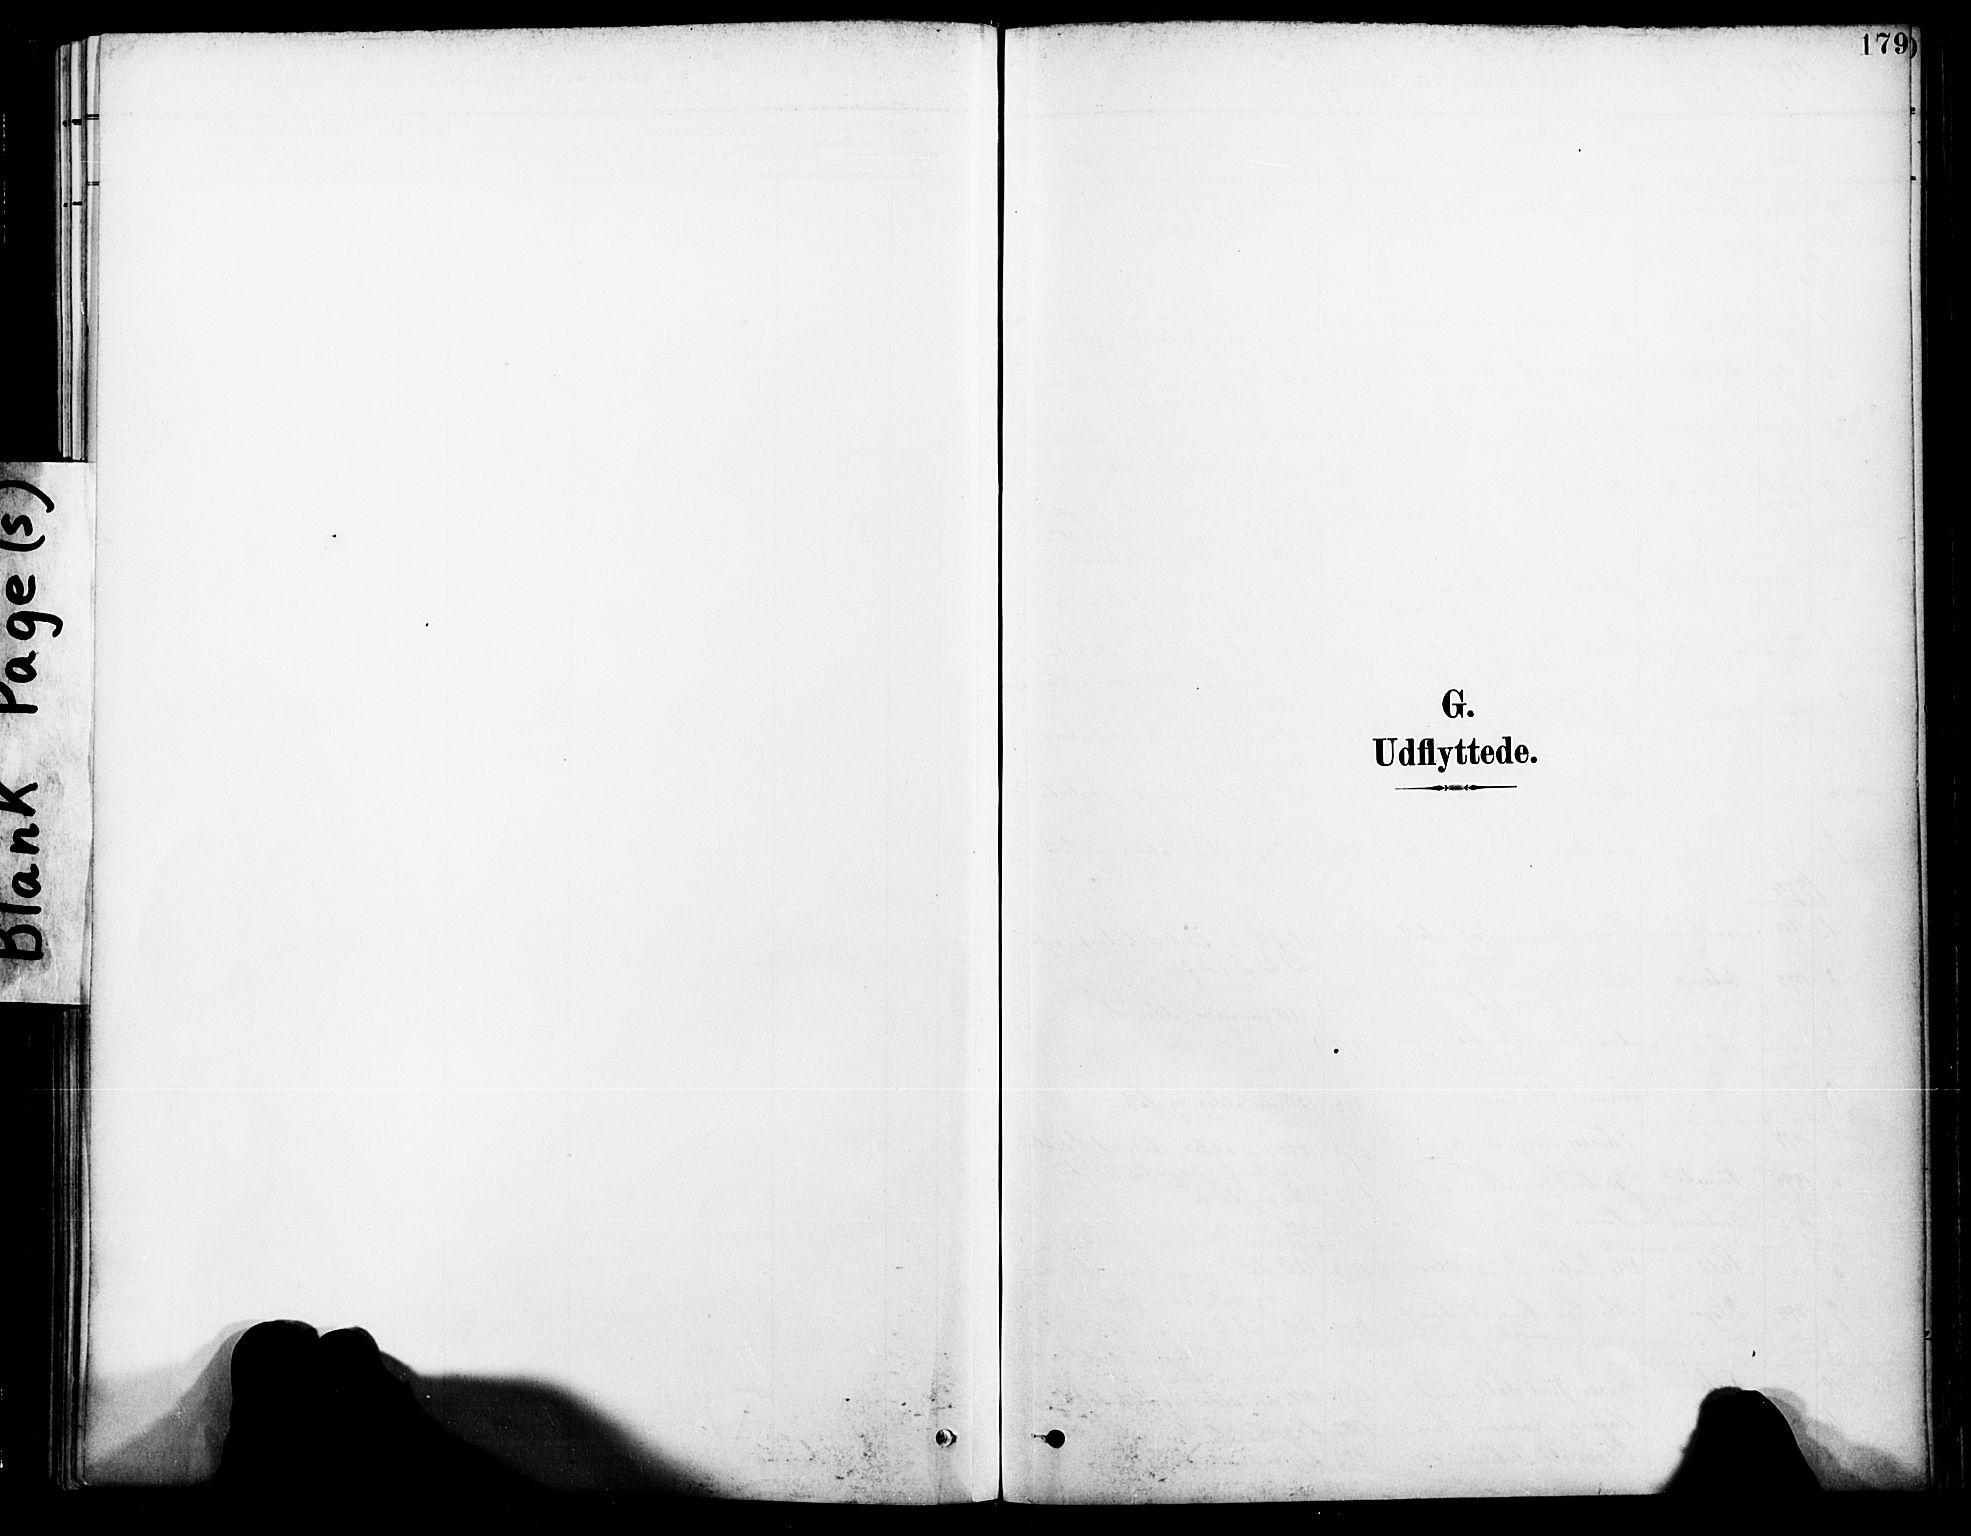 SAT, Ministerialprotokoller, klokkerbøker og fødselsregistre - Nordland, 885/L1205: Ministerialbok nr. 885A06, 1892-1905, s. 179